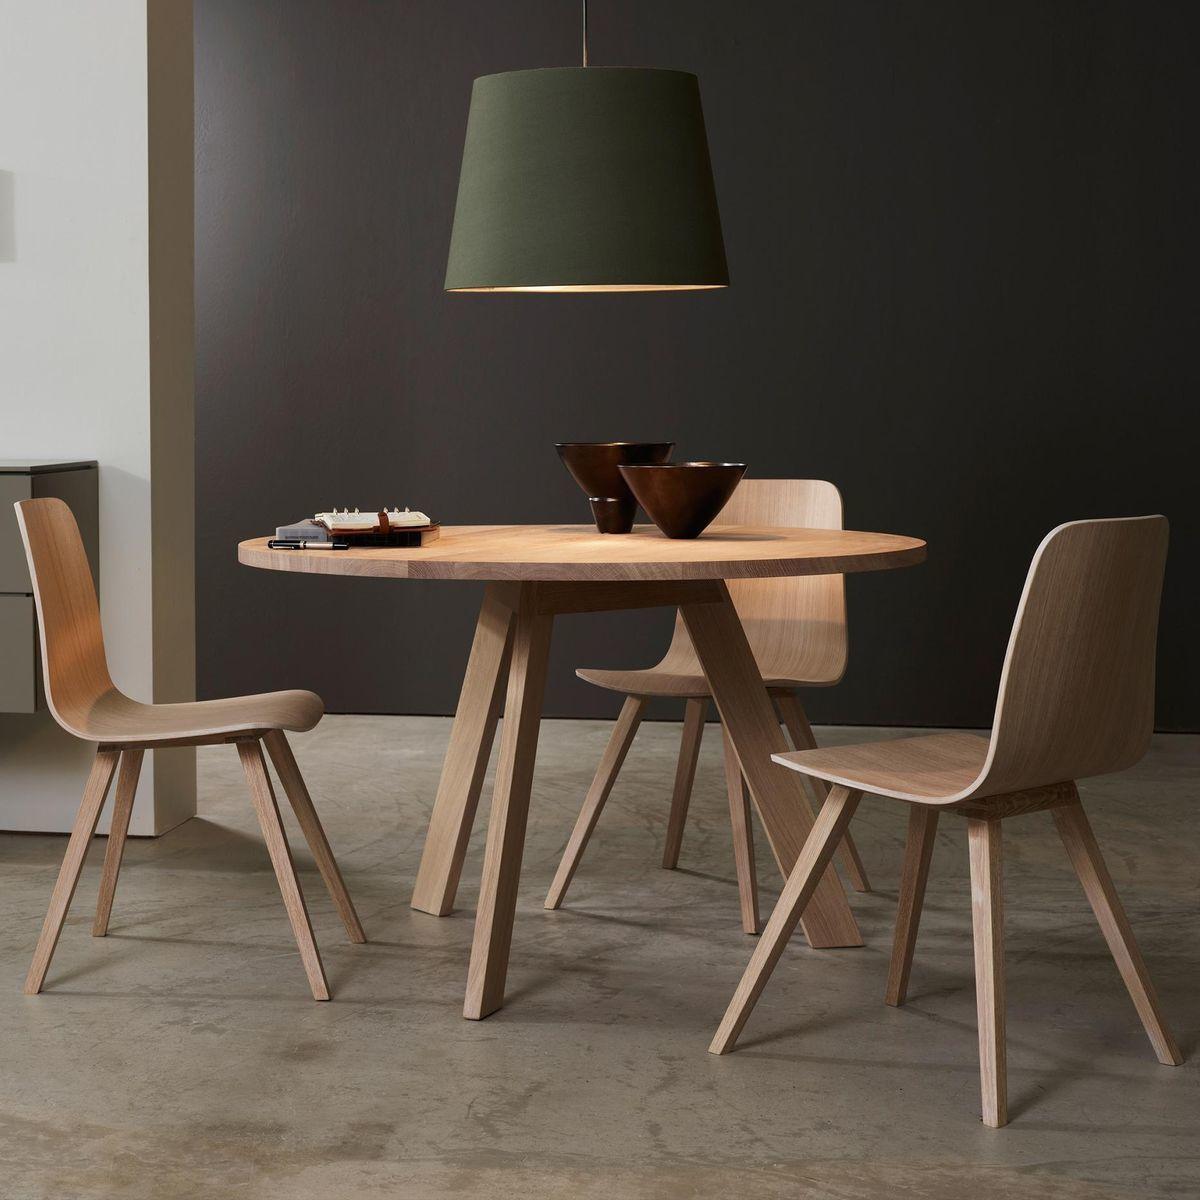 Tosh table de salle manger bois massif more tables - Table de salle a manger en bois massif ...